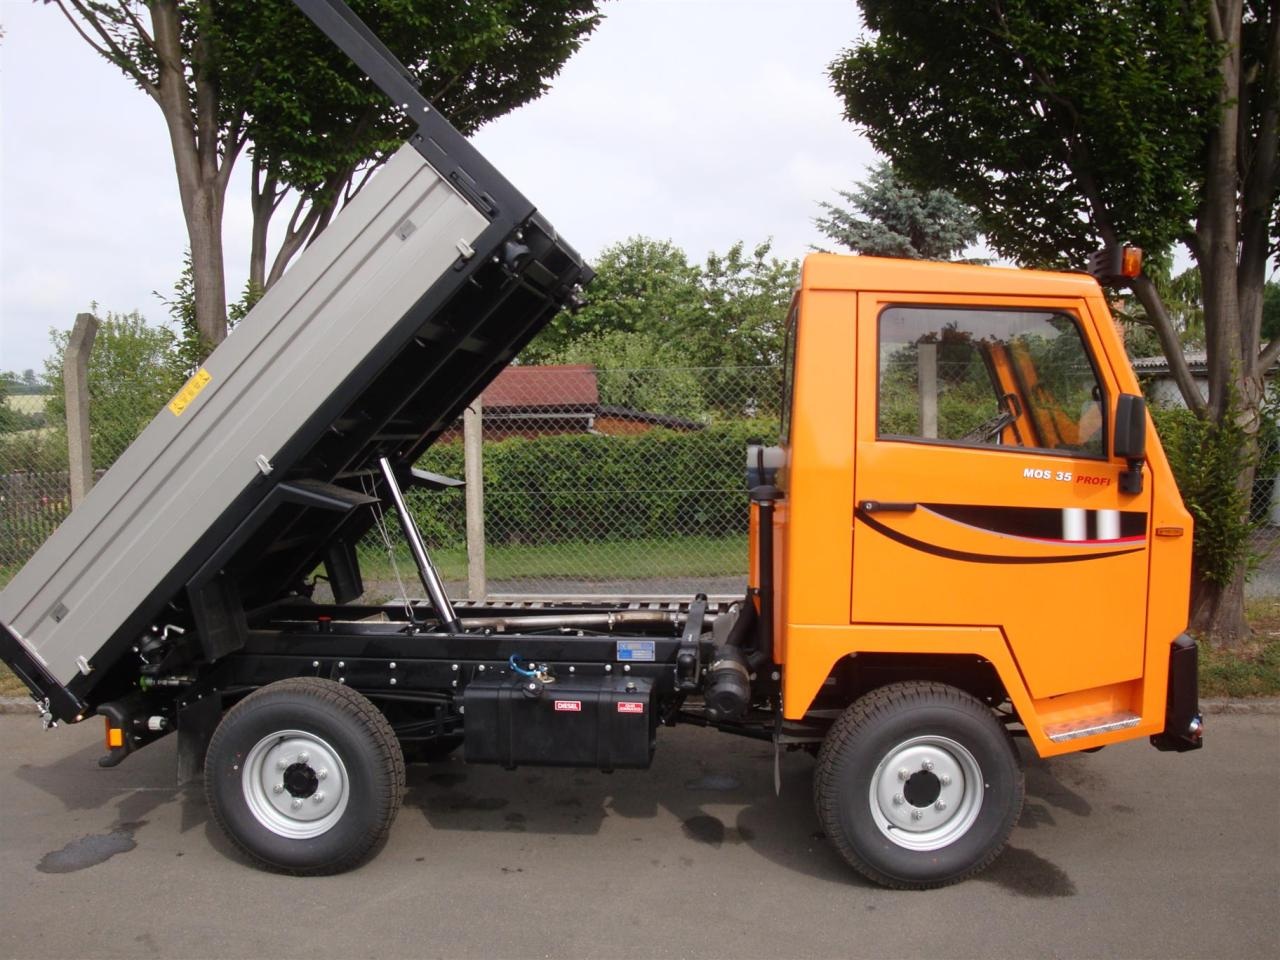 Multicar MOS 35 PROFI